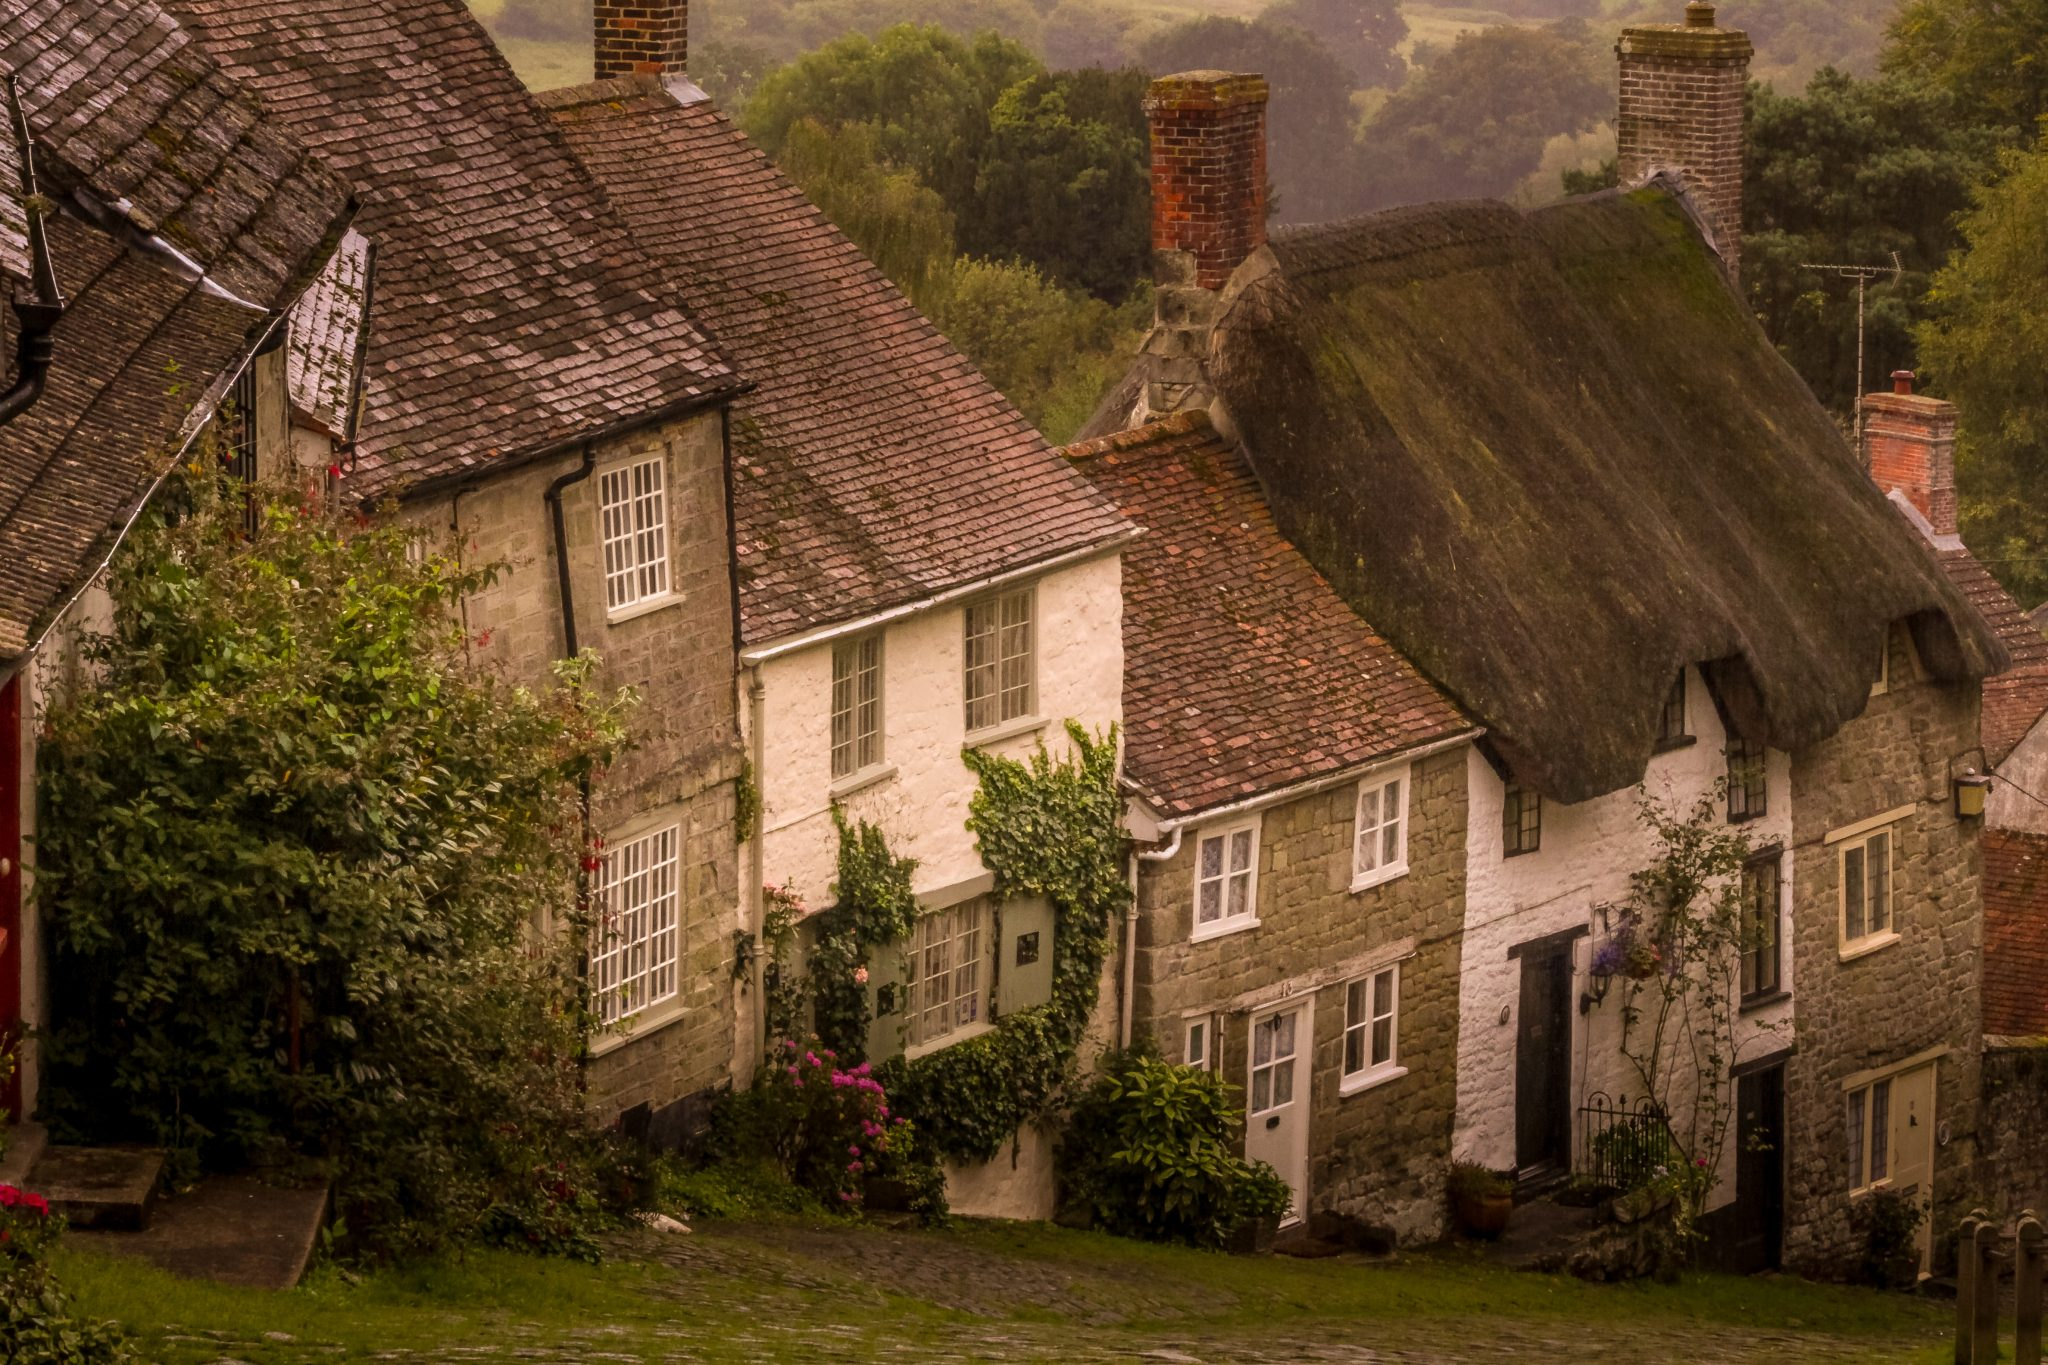 Prettiest villages UK Gold Hill Shaftesbury Dorset